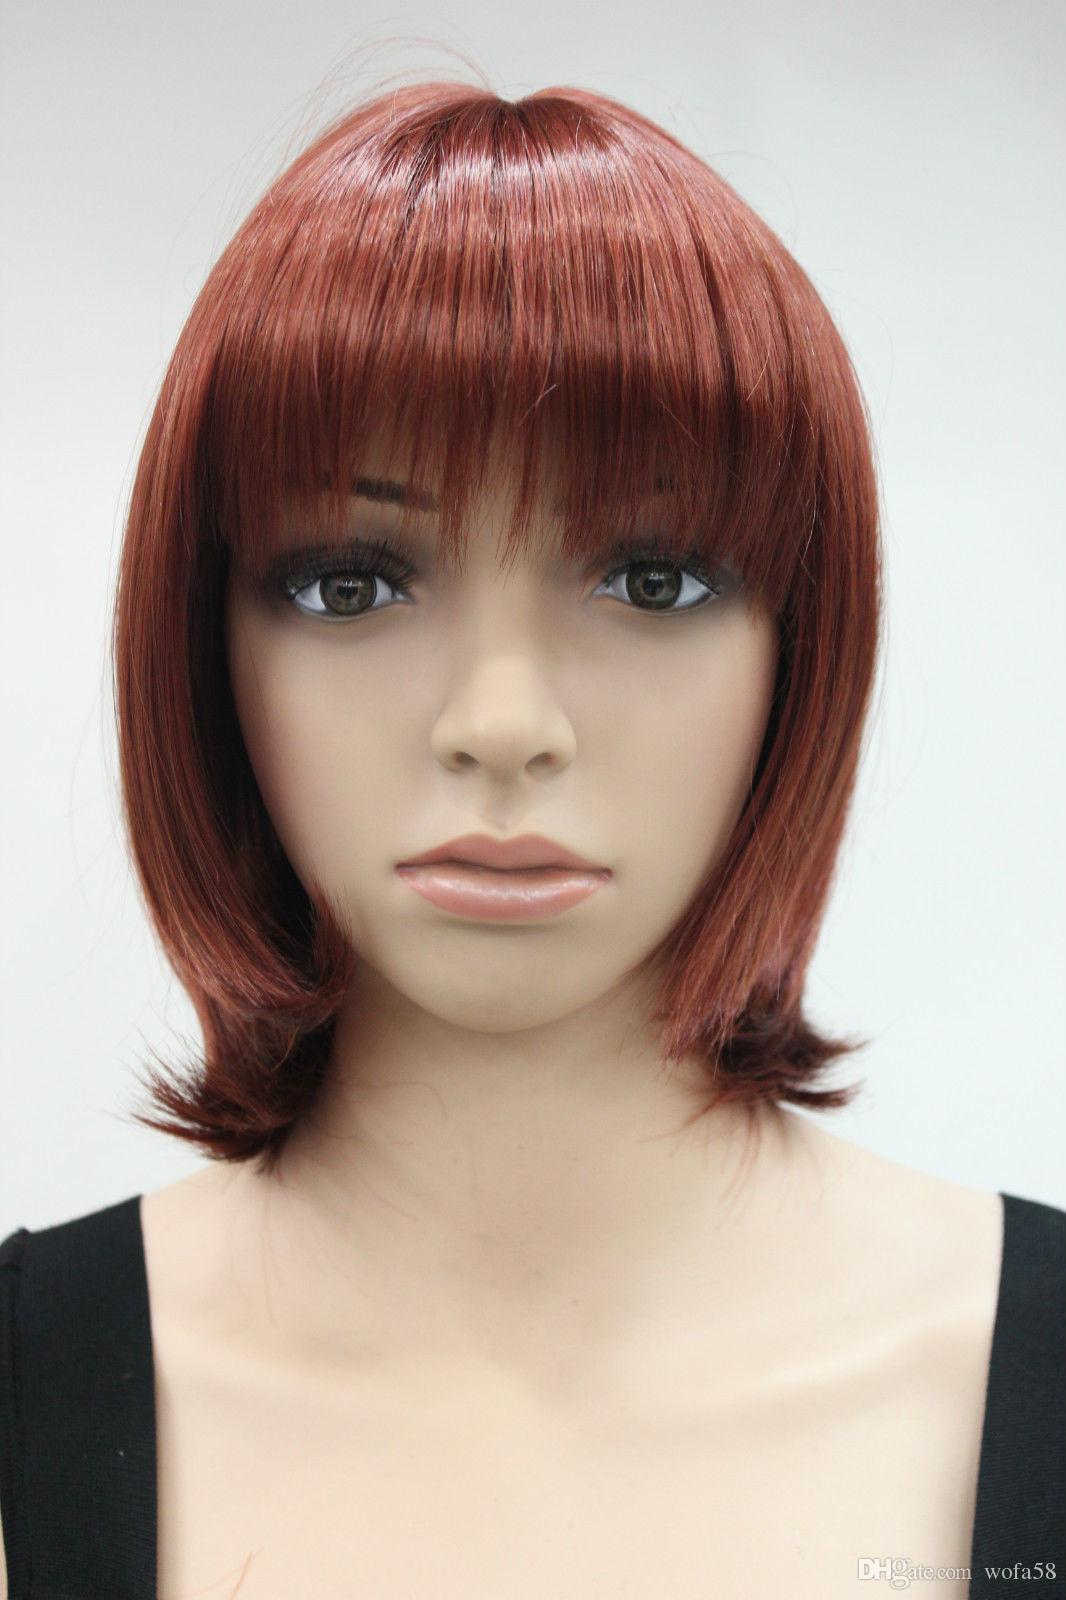 2018 Moda Cobre Rojo Corto recto flequillo vida cotidiana peluca